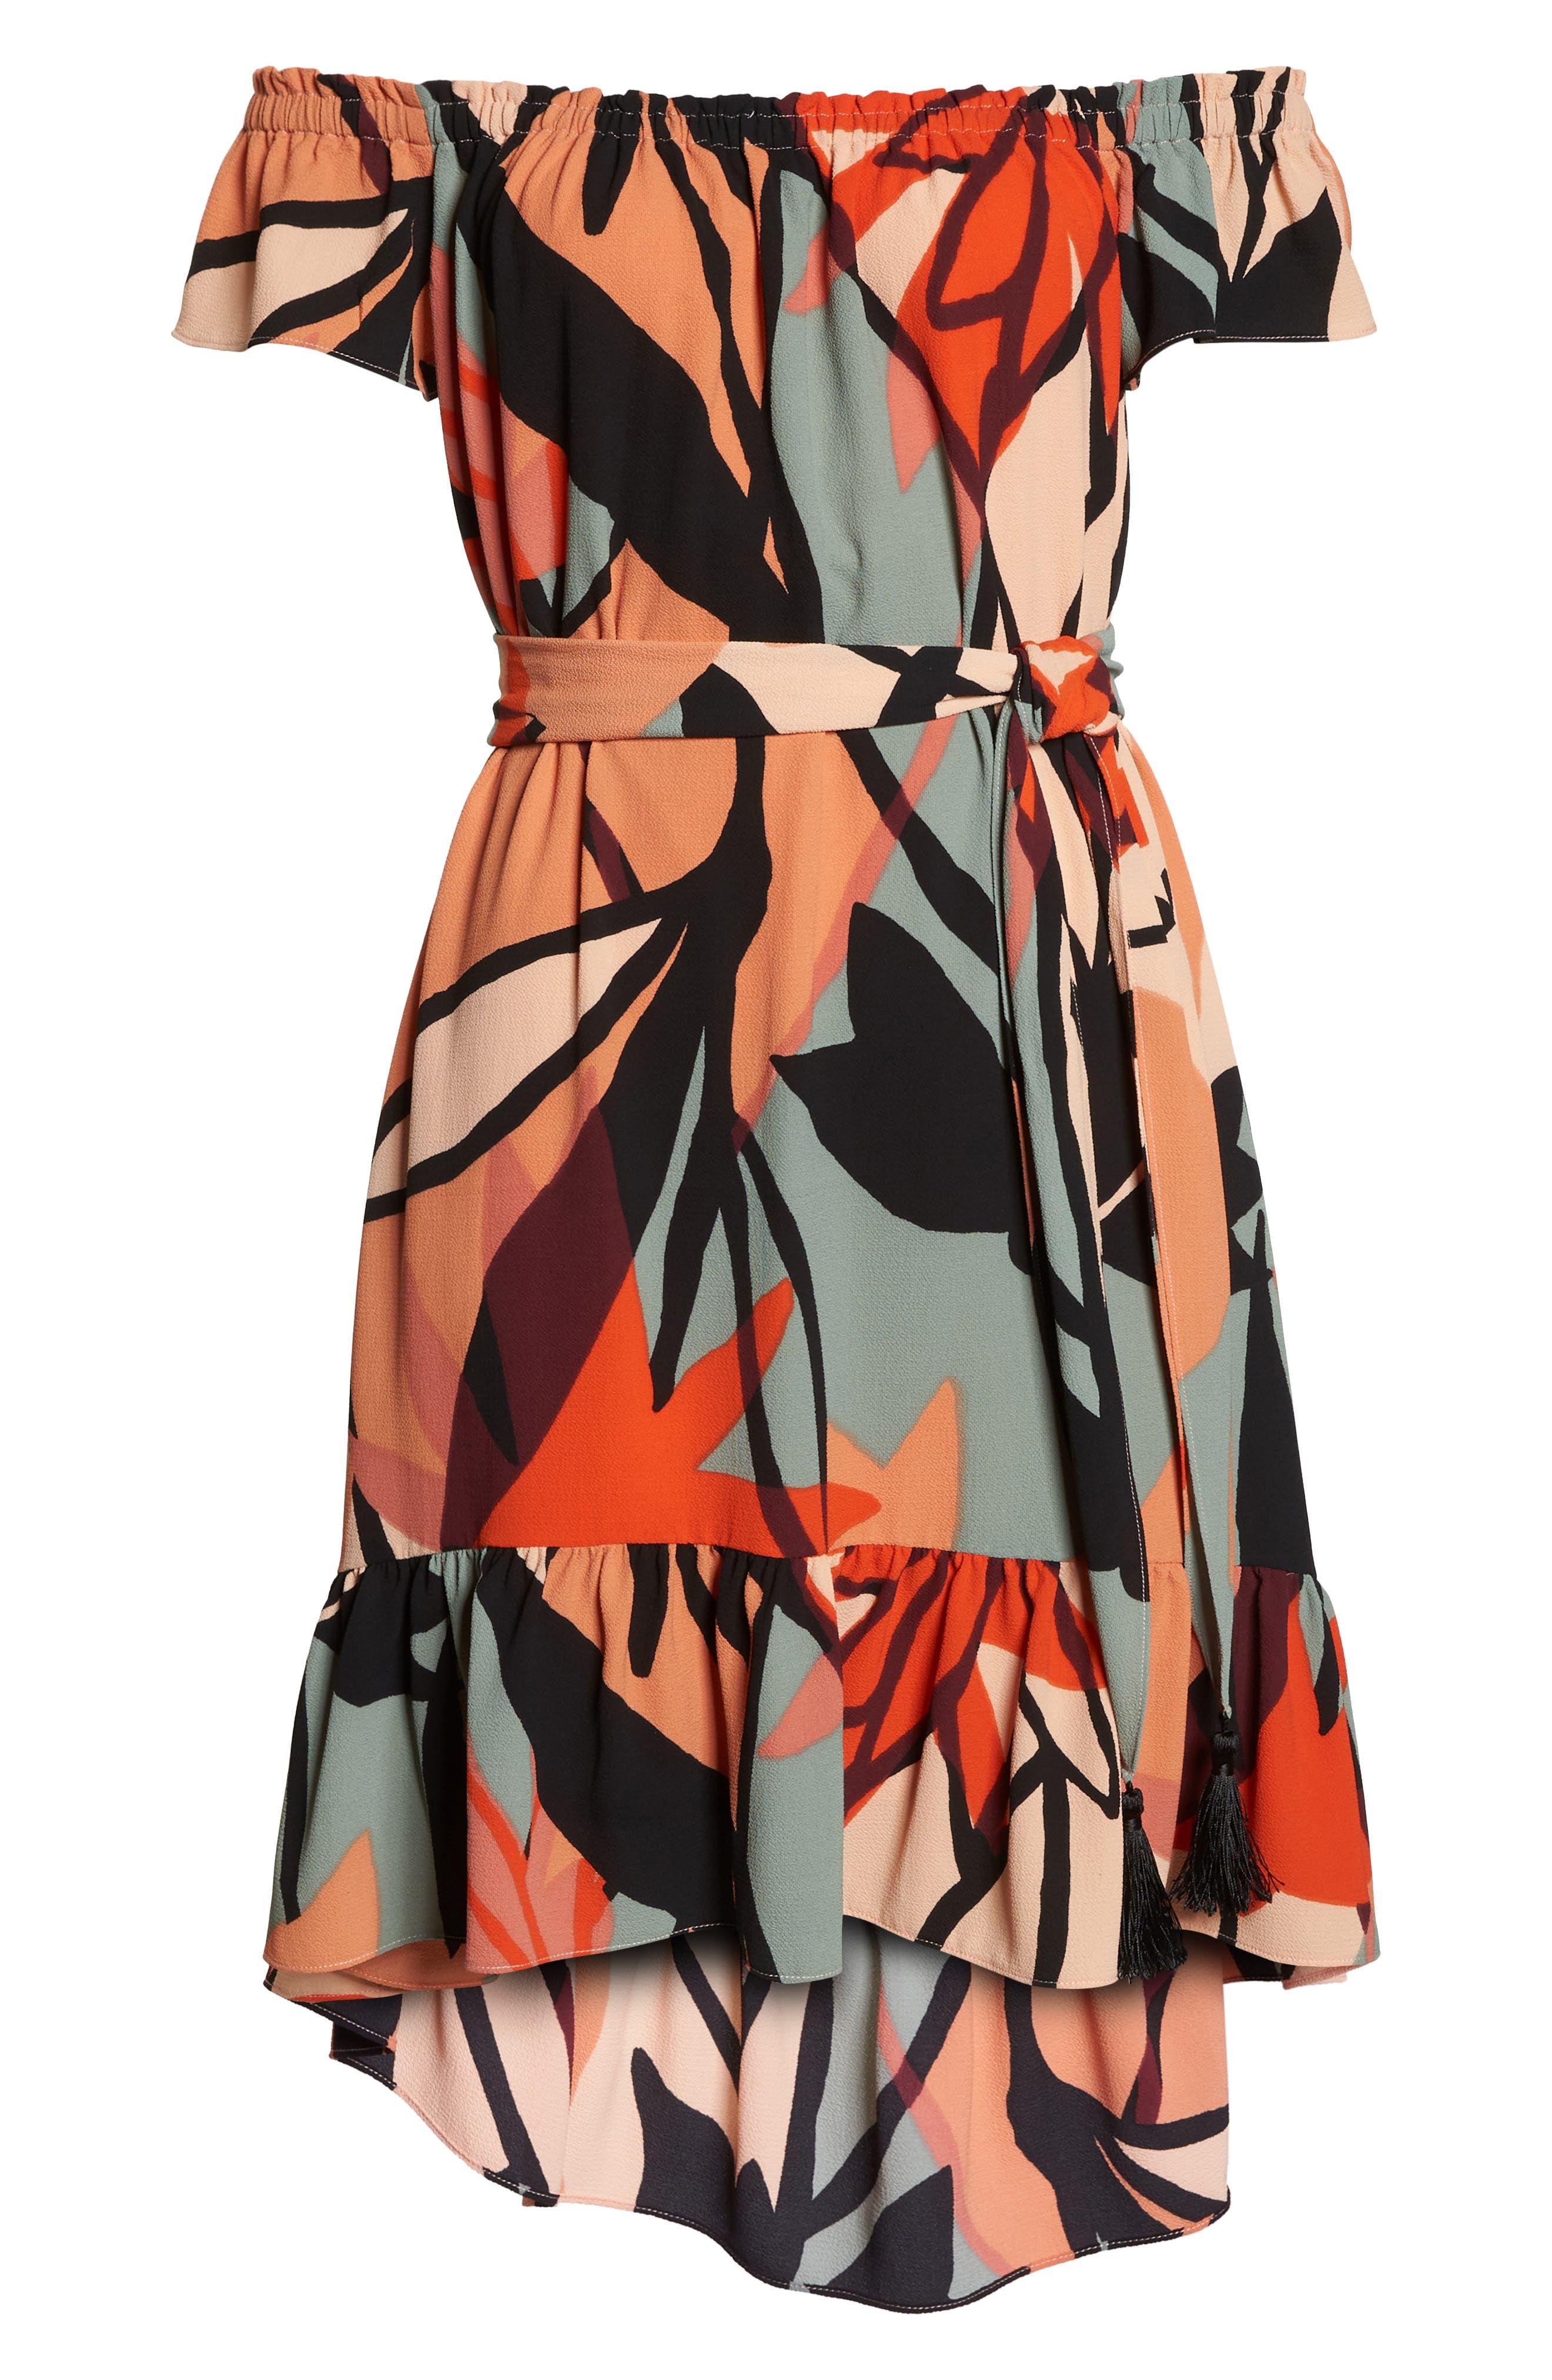 CLOVER AND SLOANE,                             Off the Shoulder Bubble Crepe Dress,                             Alternate thumbnail 7, color,                             800